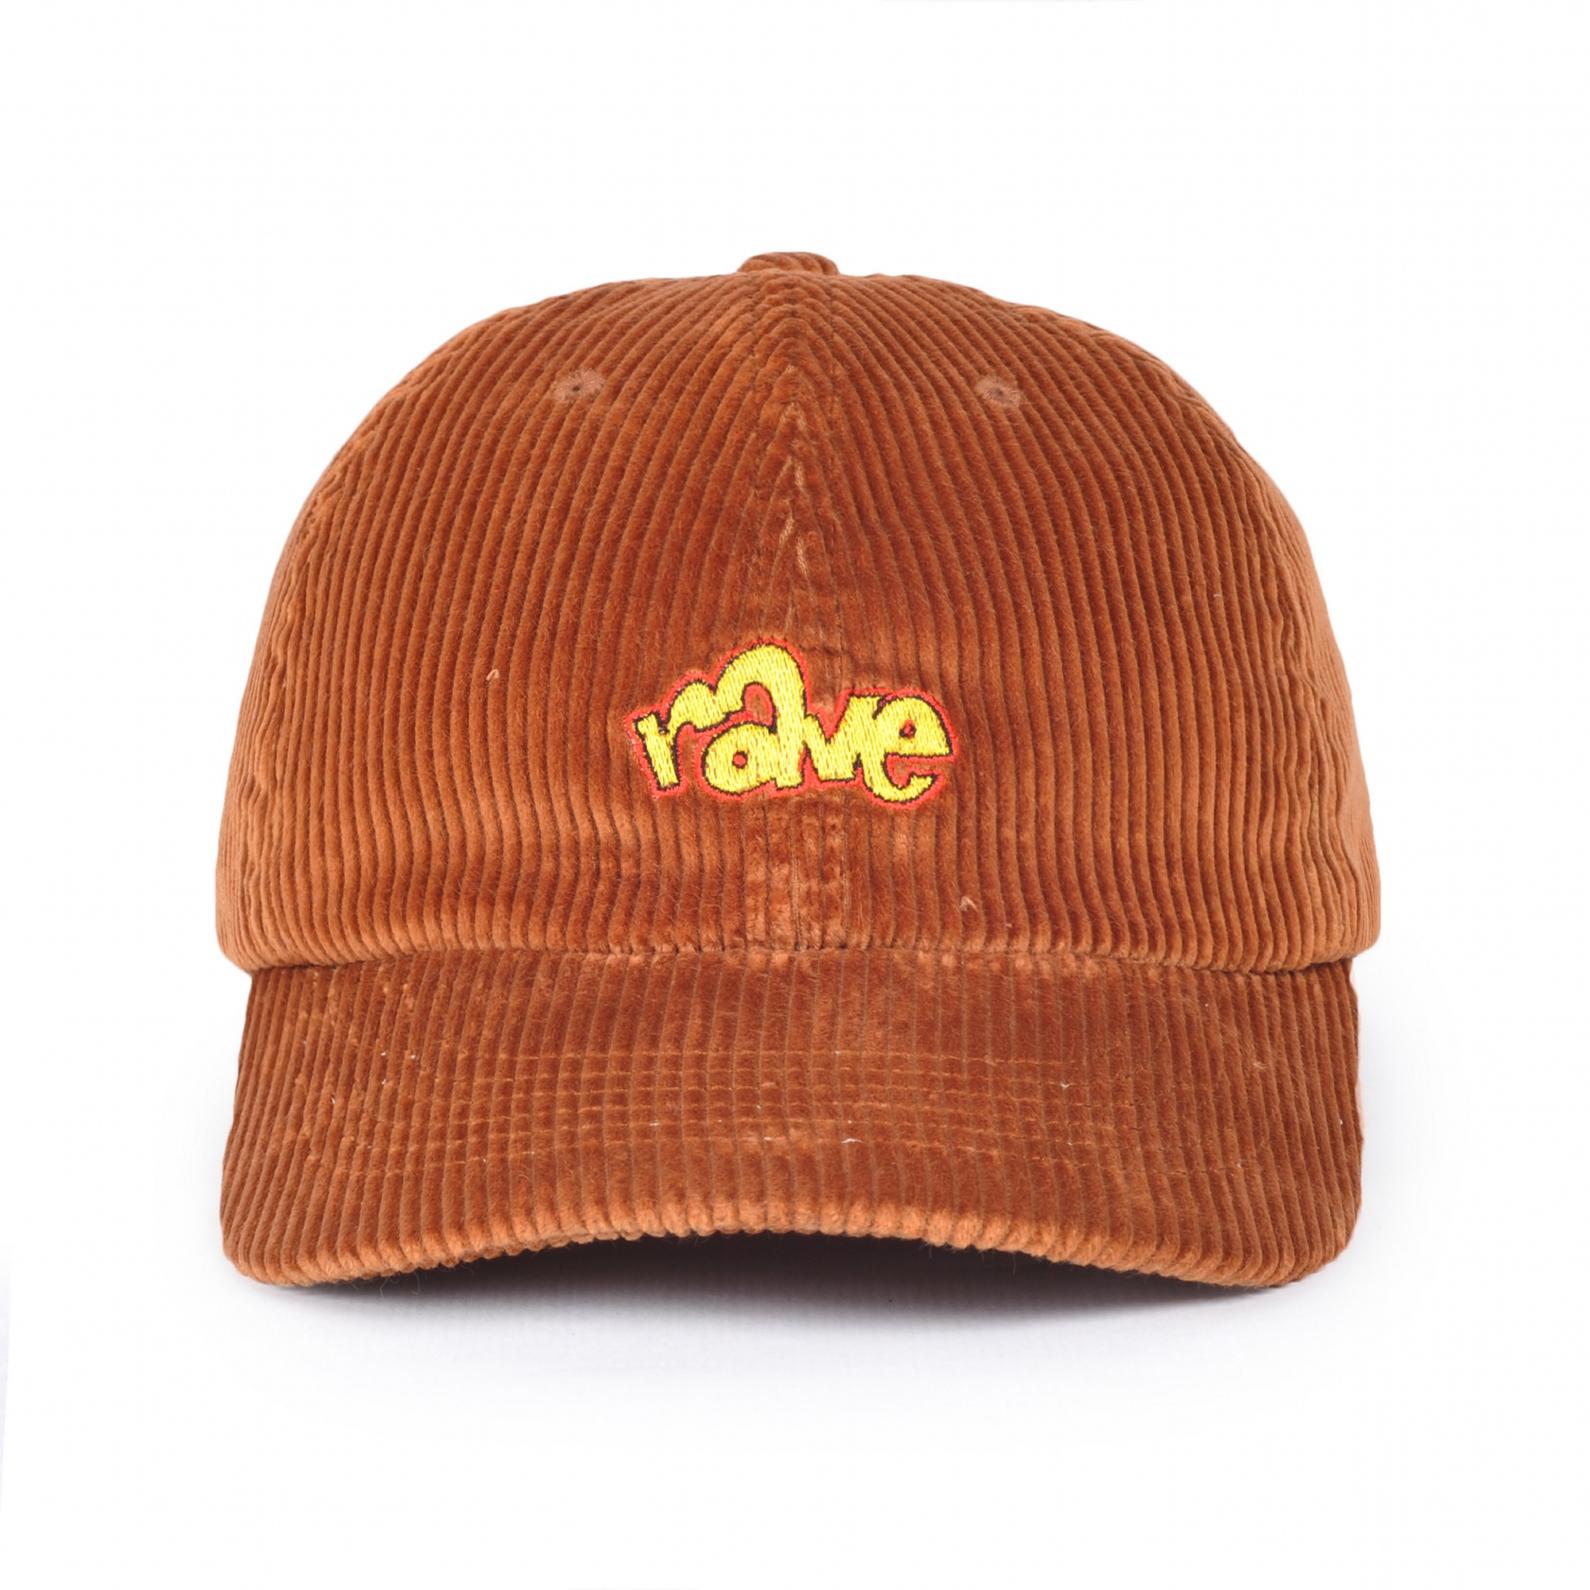 【RAVE SKATEBOARDS/レイブスケートボード】SPIKE CORDUROY CAP コーデュロイダドキャップ / CAMEL